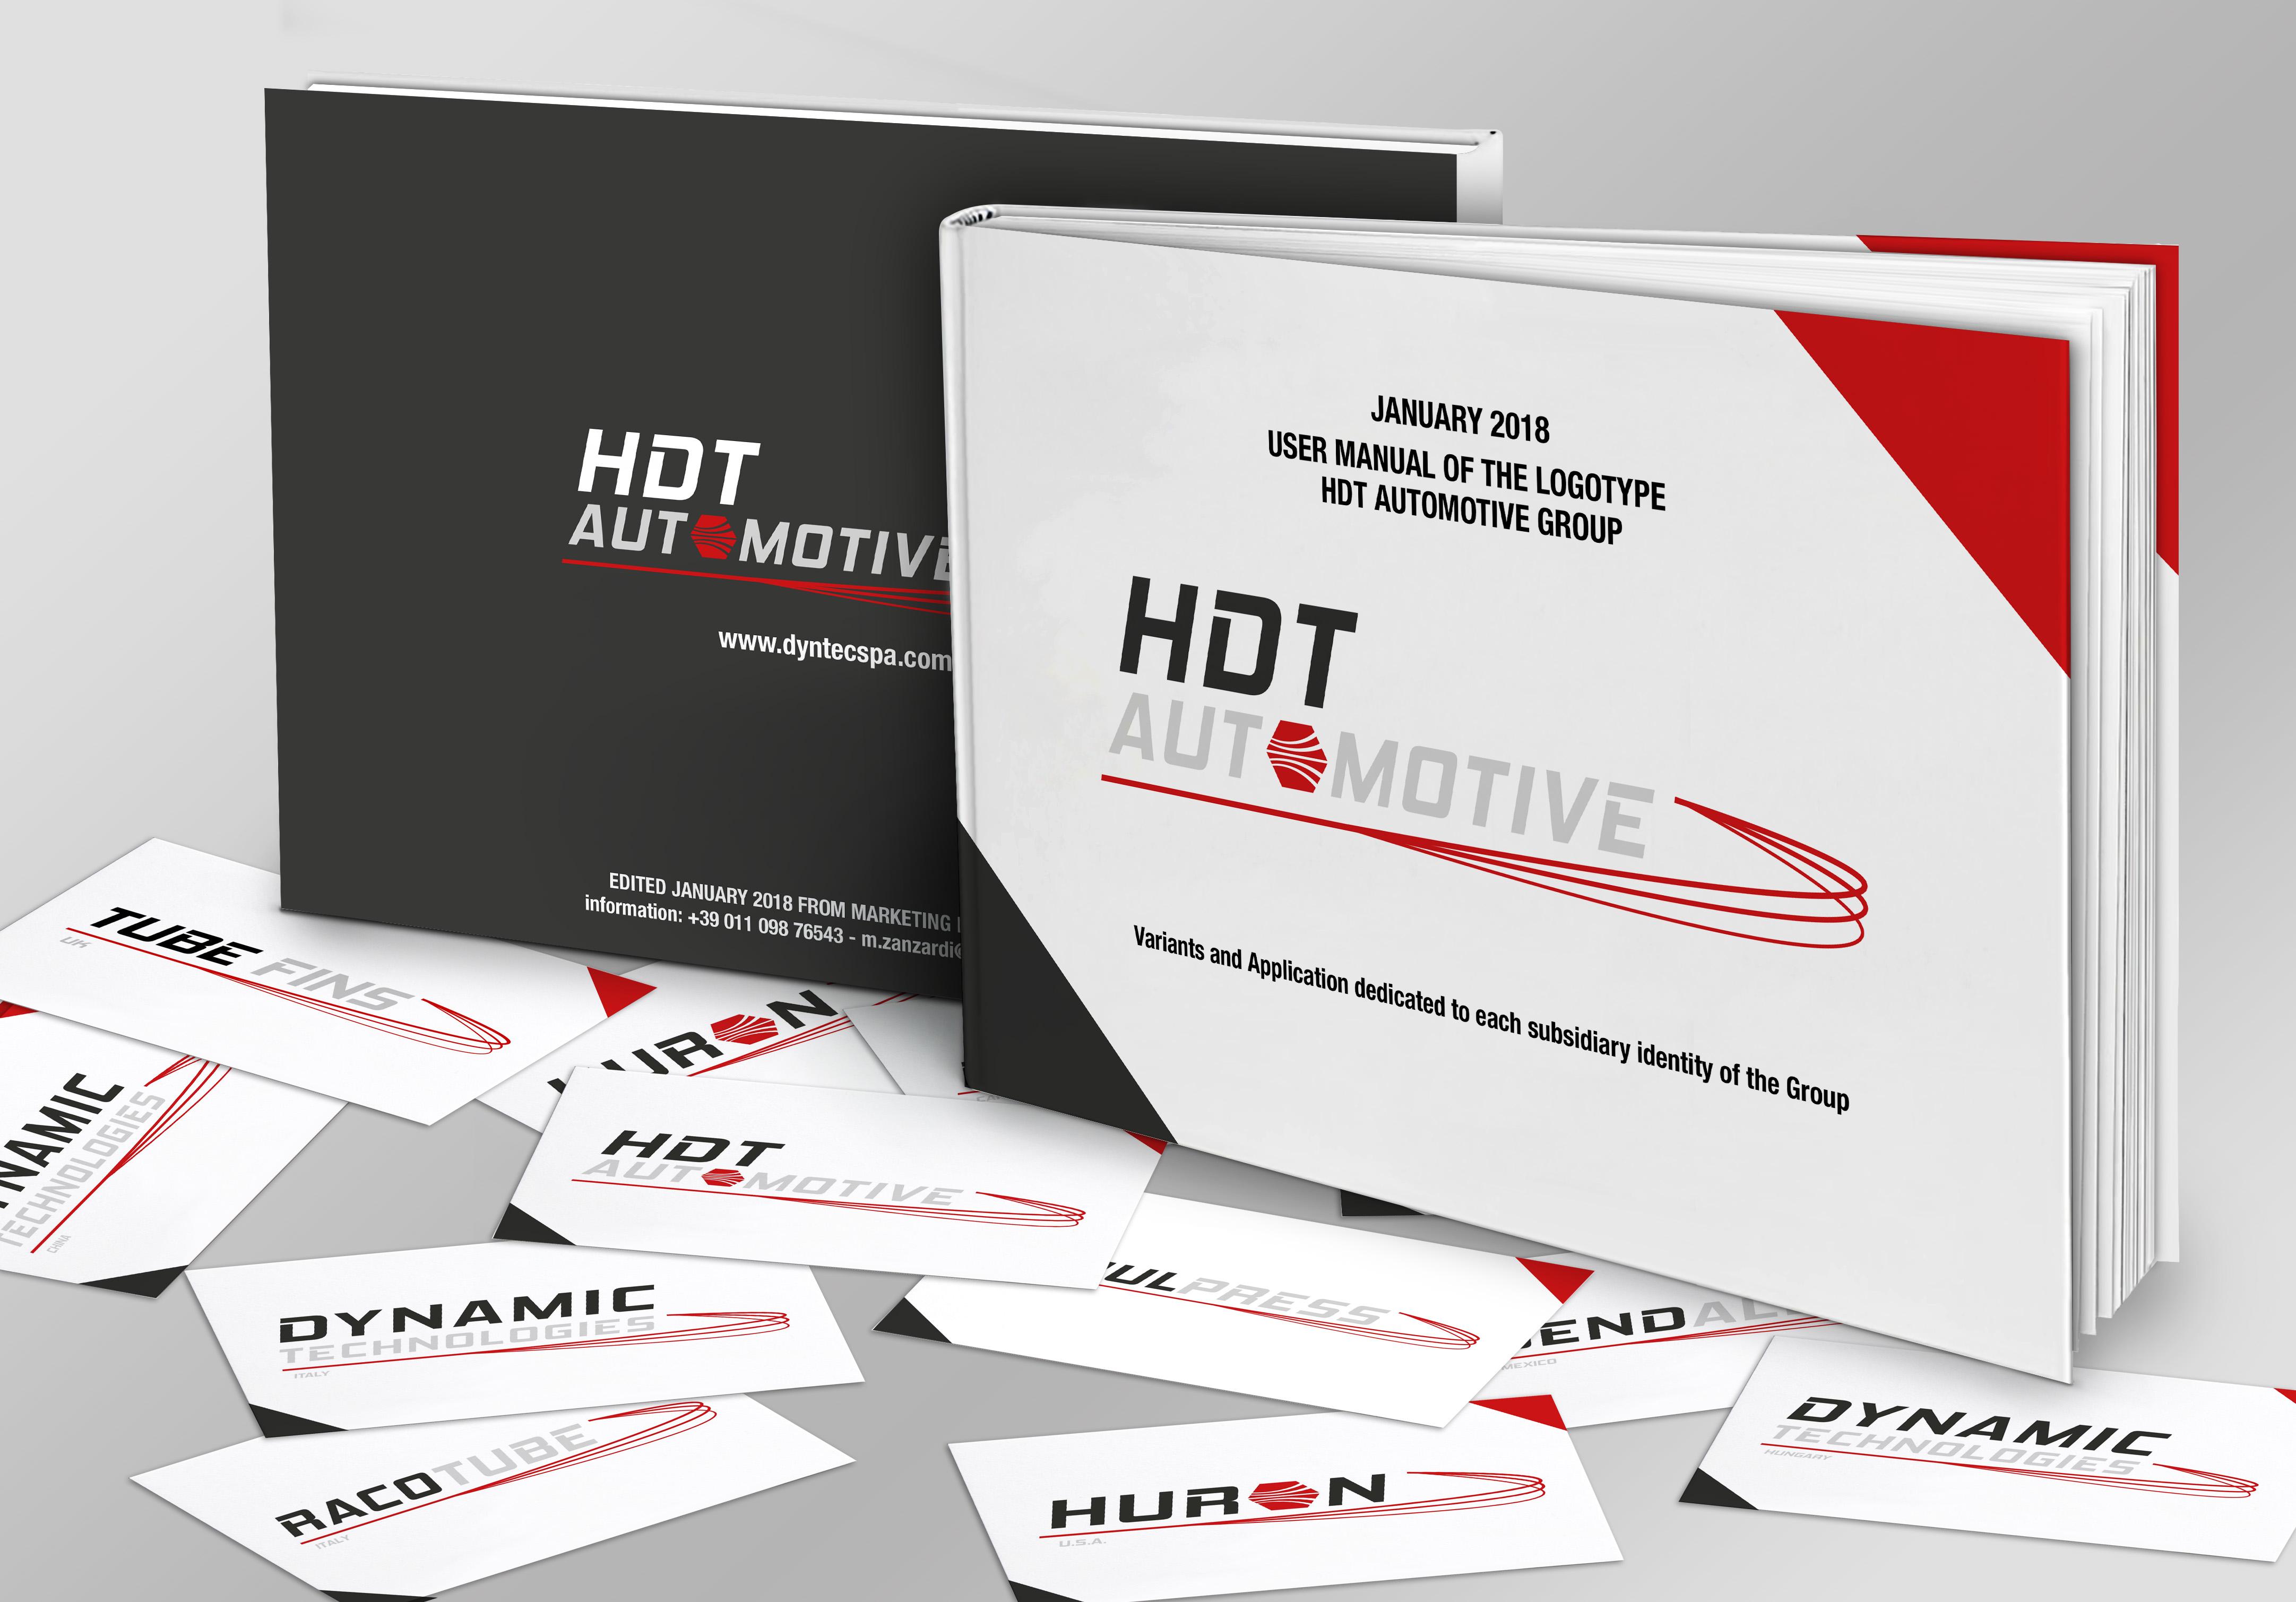 HDT - Dynamic Technologies